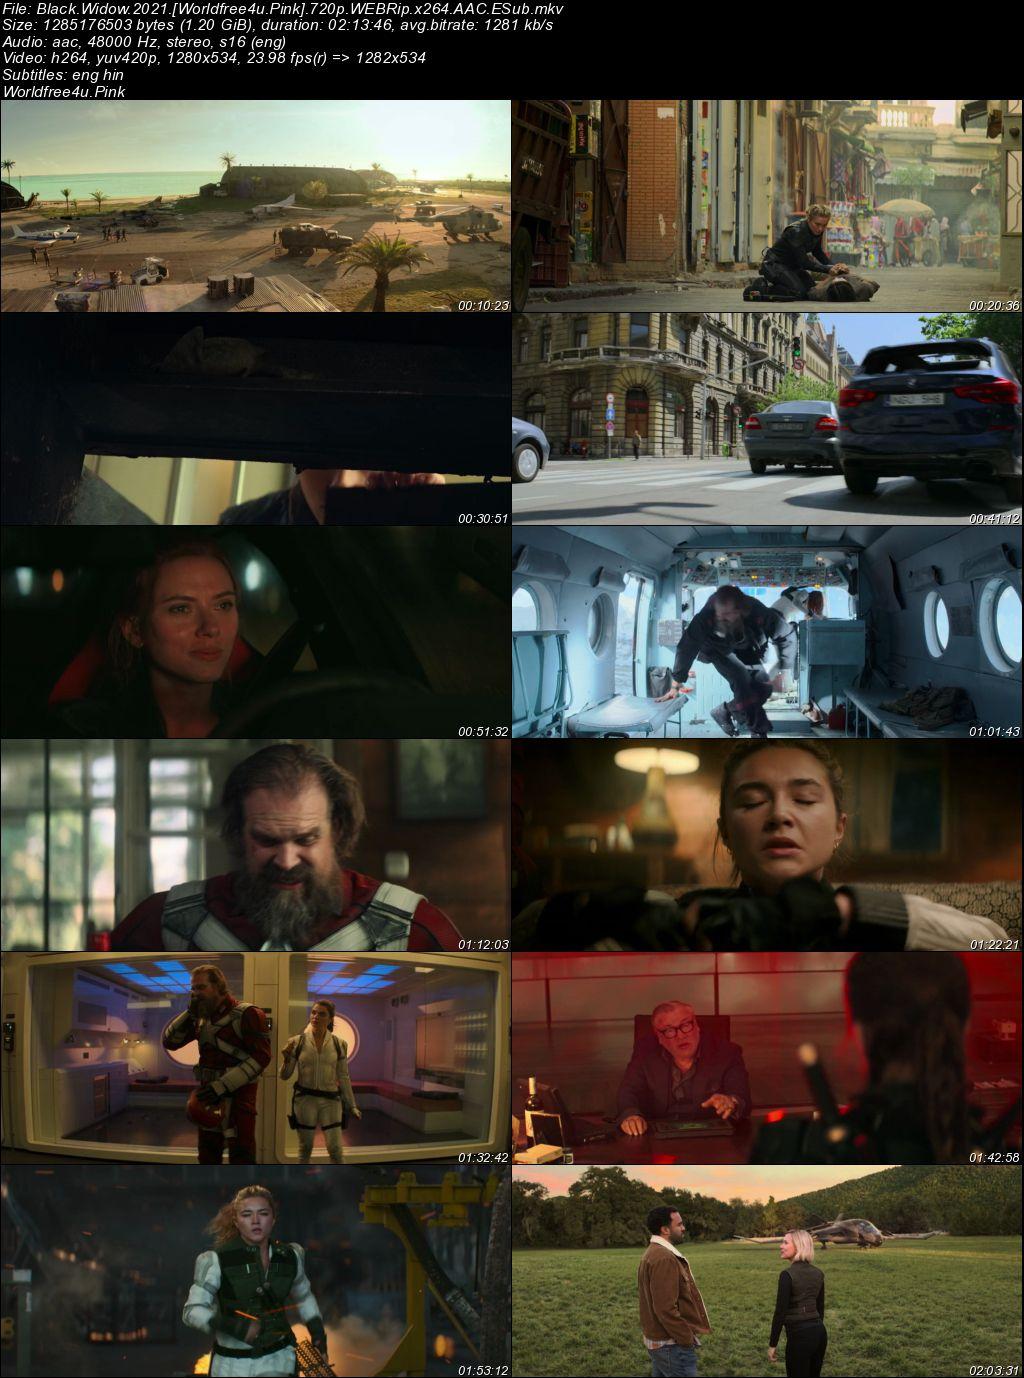 Black Widow 2021 English Movie Download    HDRip 720p